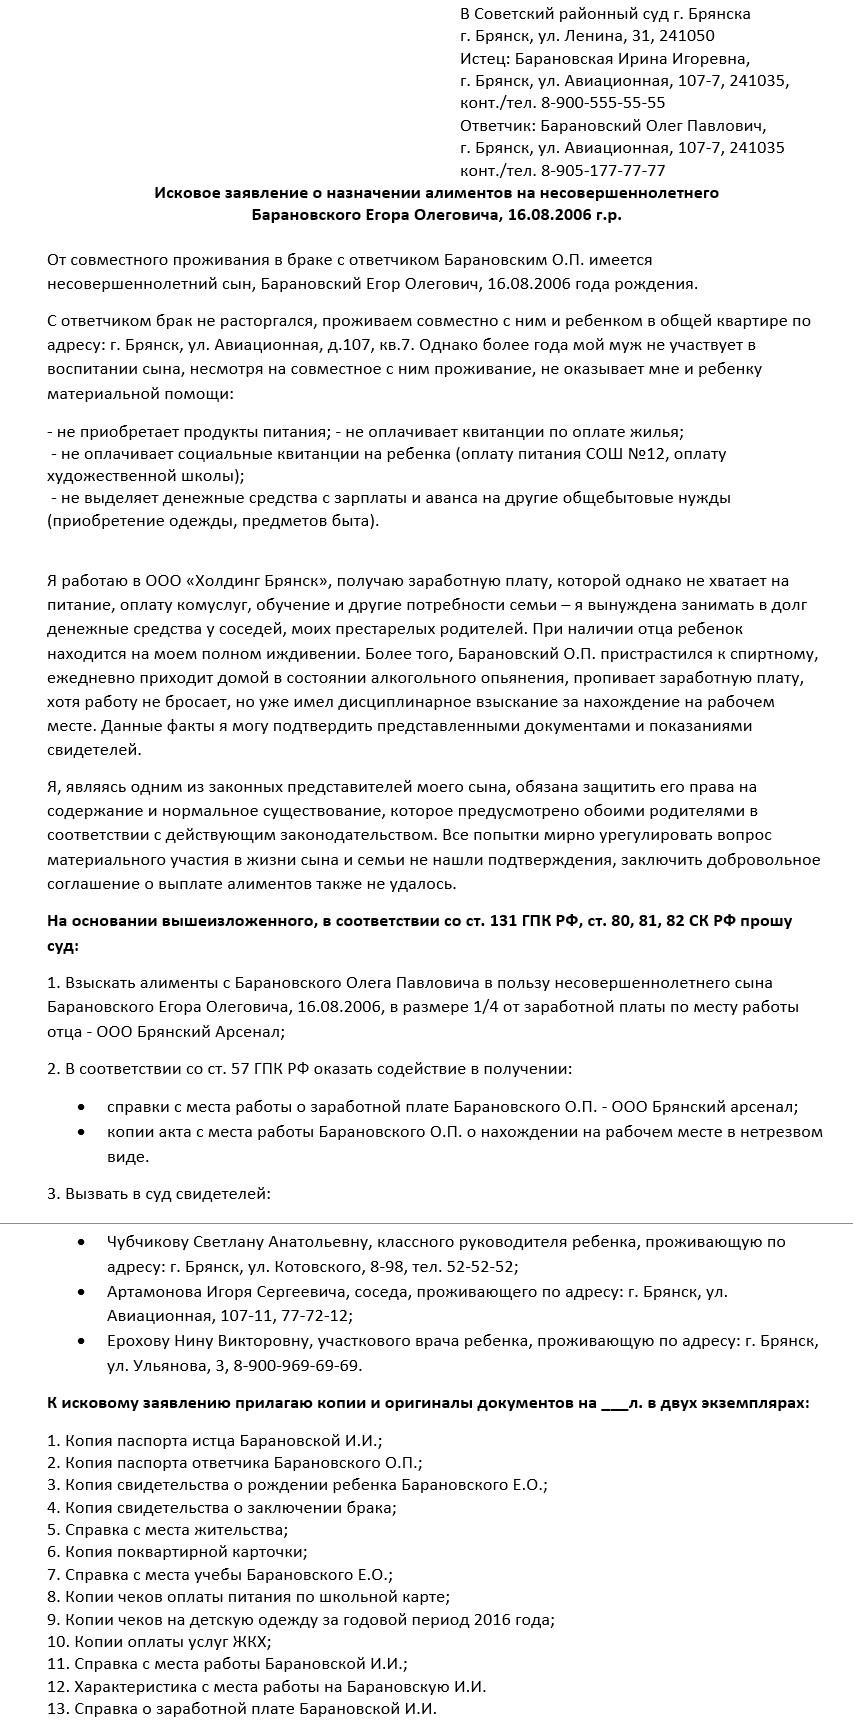 primer-iska-o-vzyskanii-alimentov-na-1-rebenka-v-brake